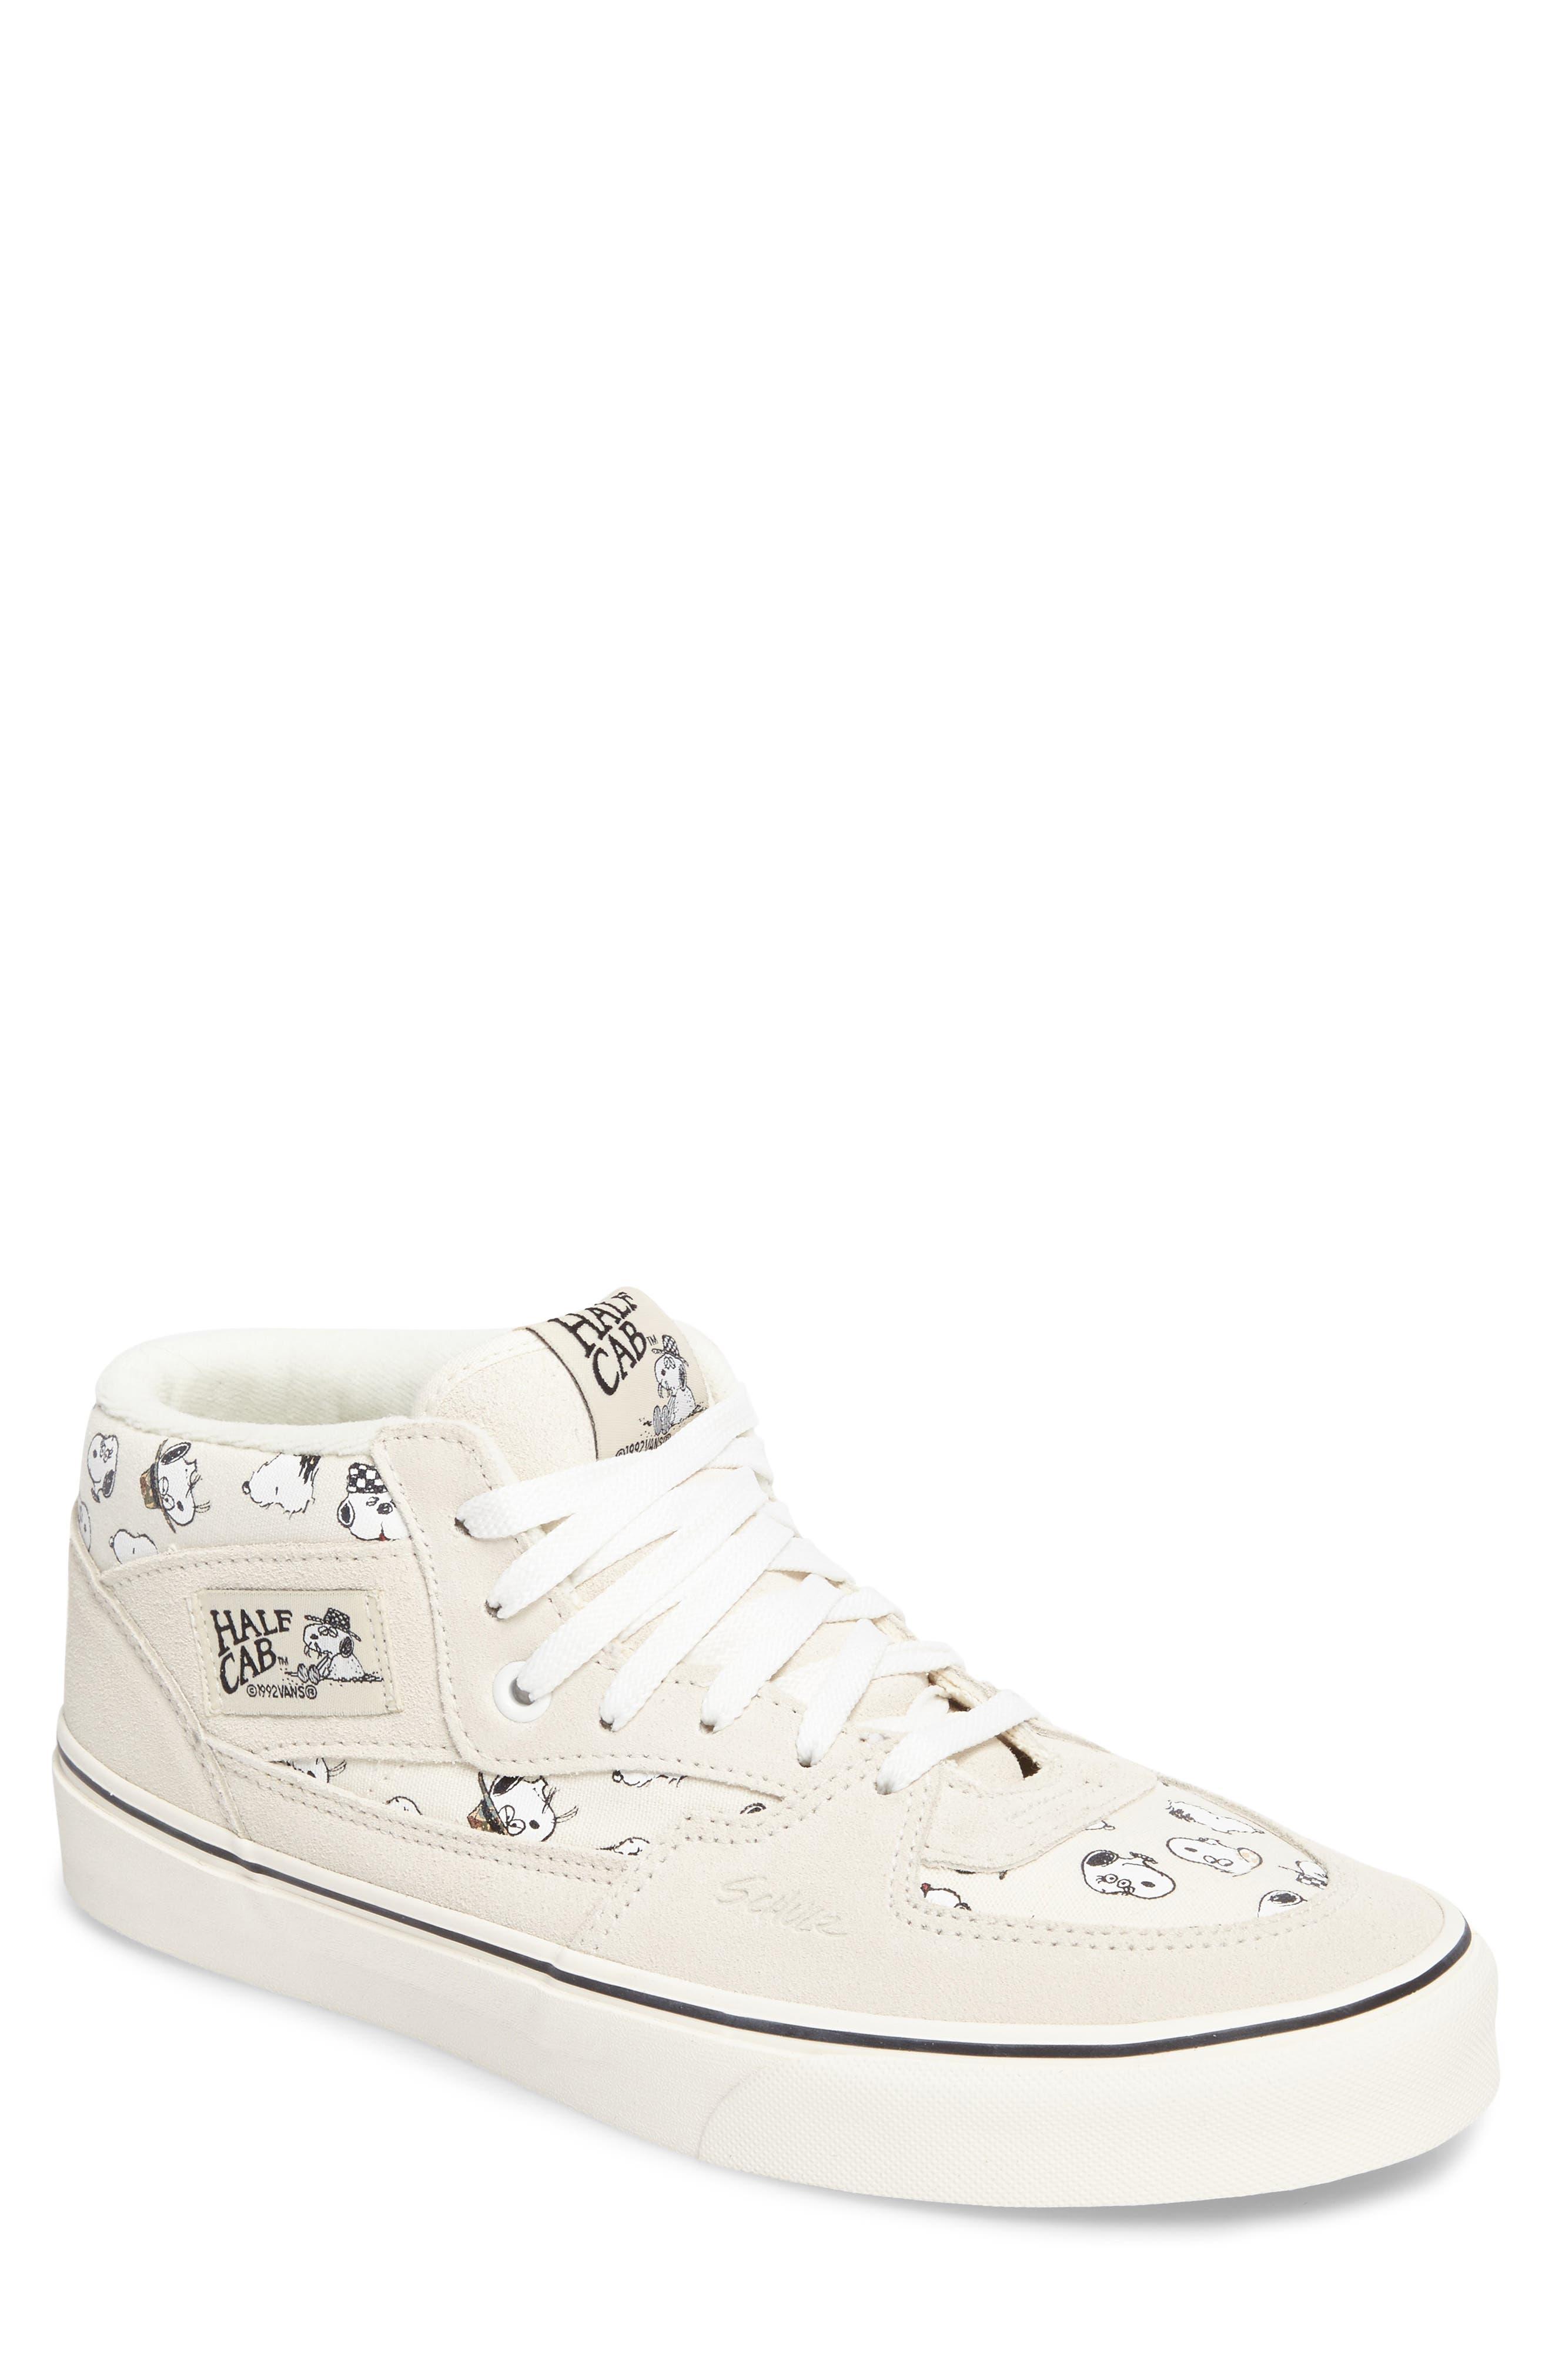 x Peanuts<sup>®</sup> Half Cab Sneaker,                         Main,                         color, Marshmallow Canvas/Suede